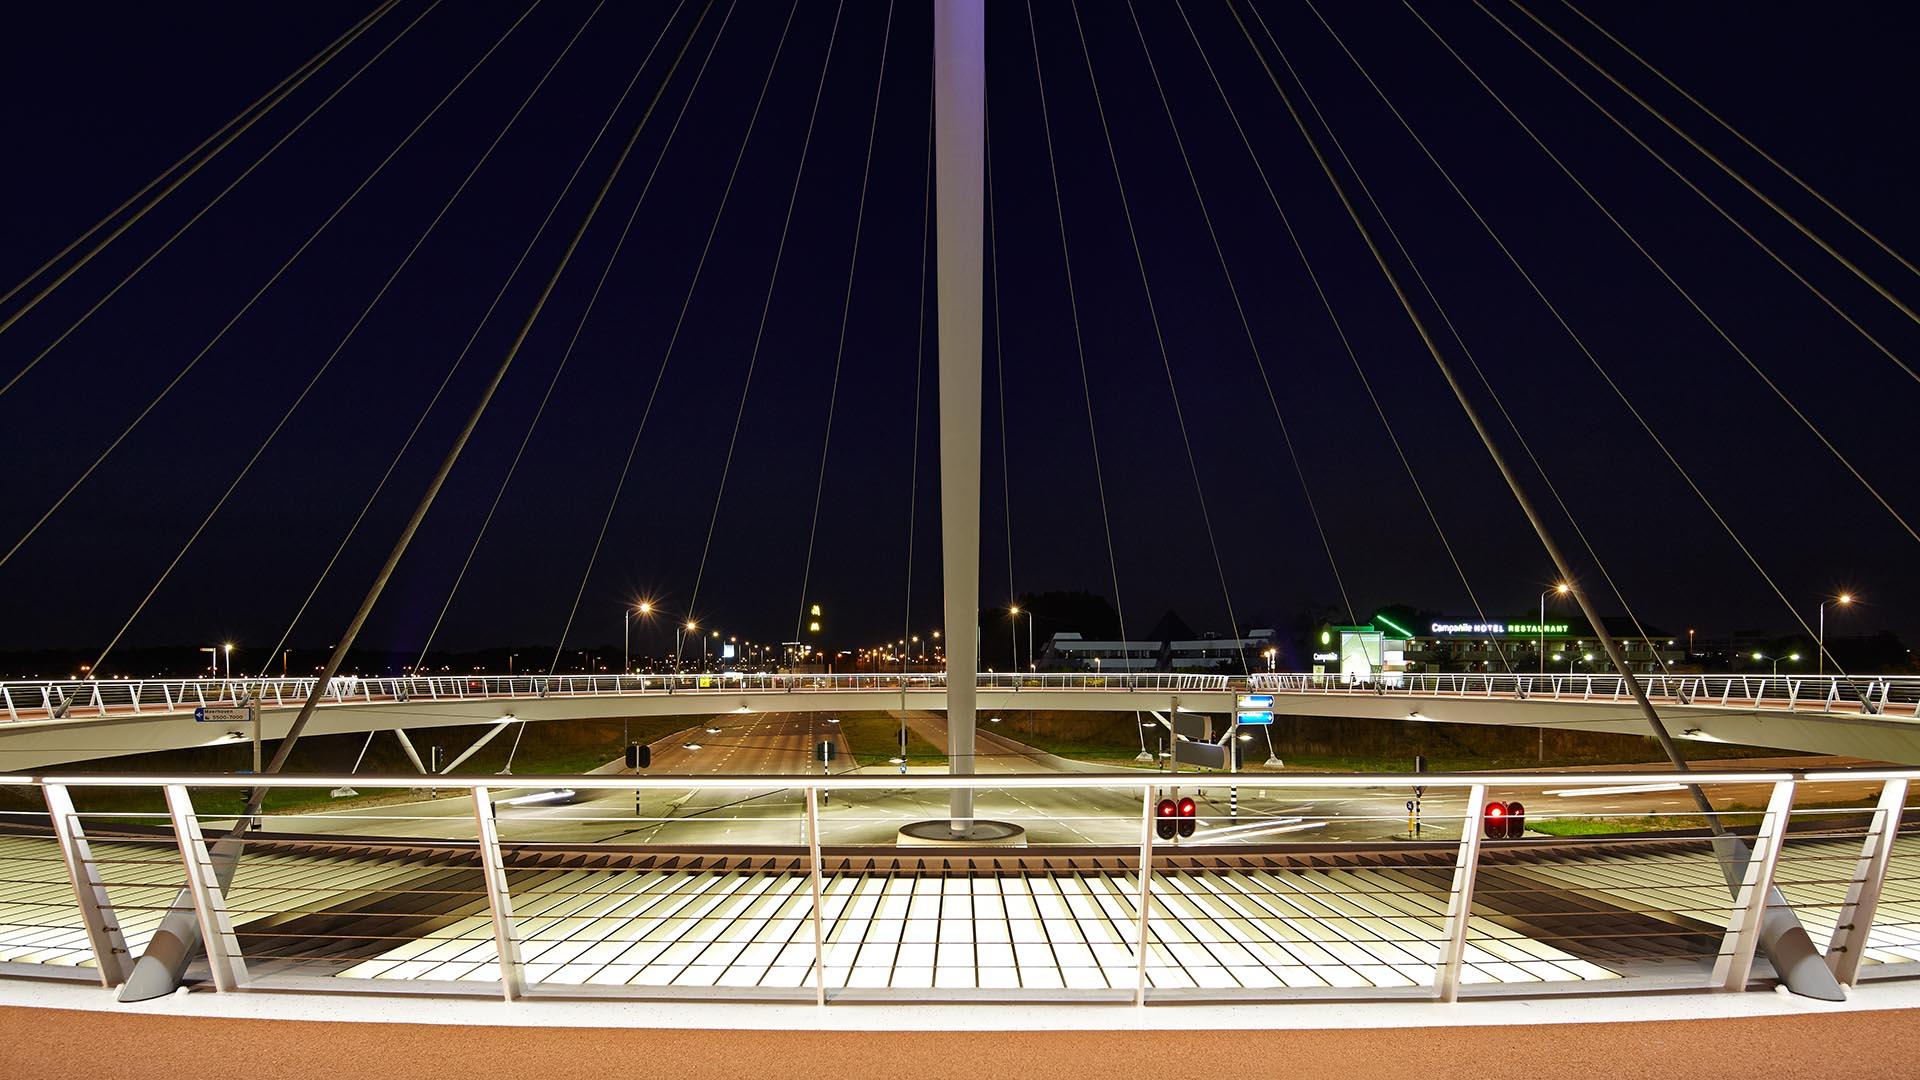 Hovenring Ipv Delft Creative Engineers The Next Diagram On Right I Have Cut Through A Suspension Bridge Image Andreas Secci Previousnext